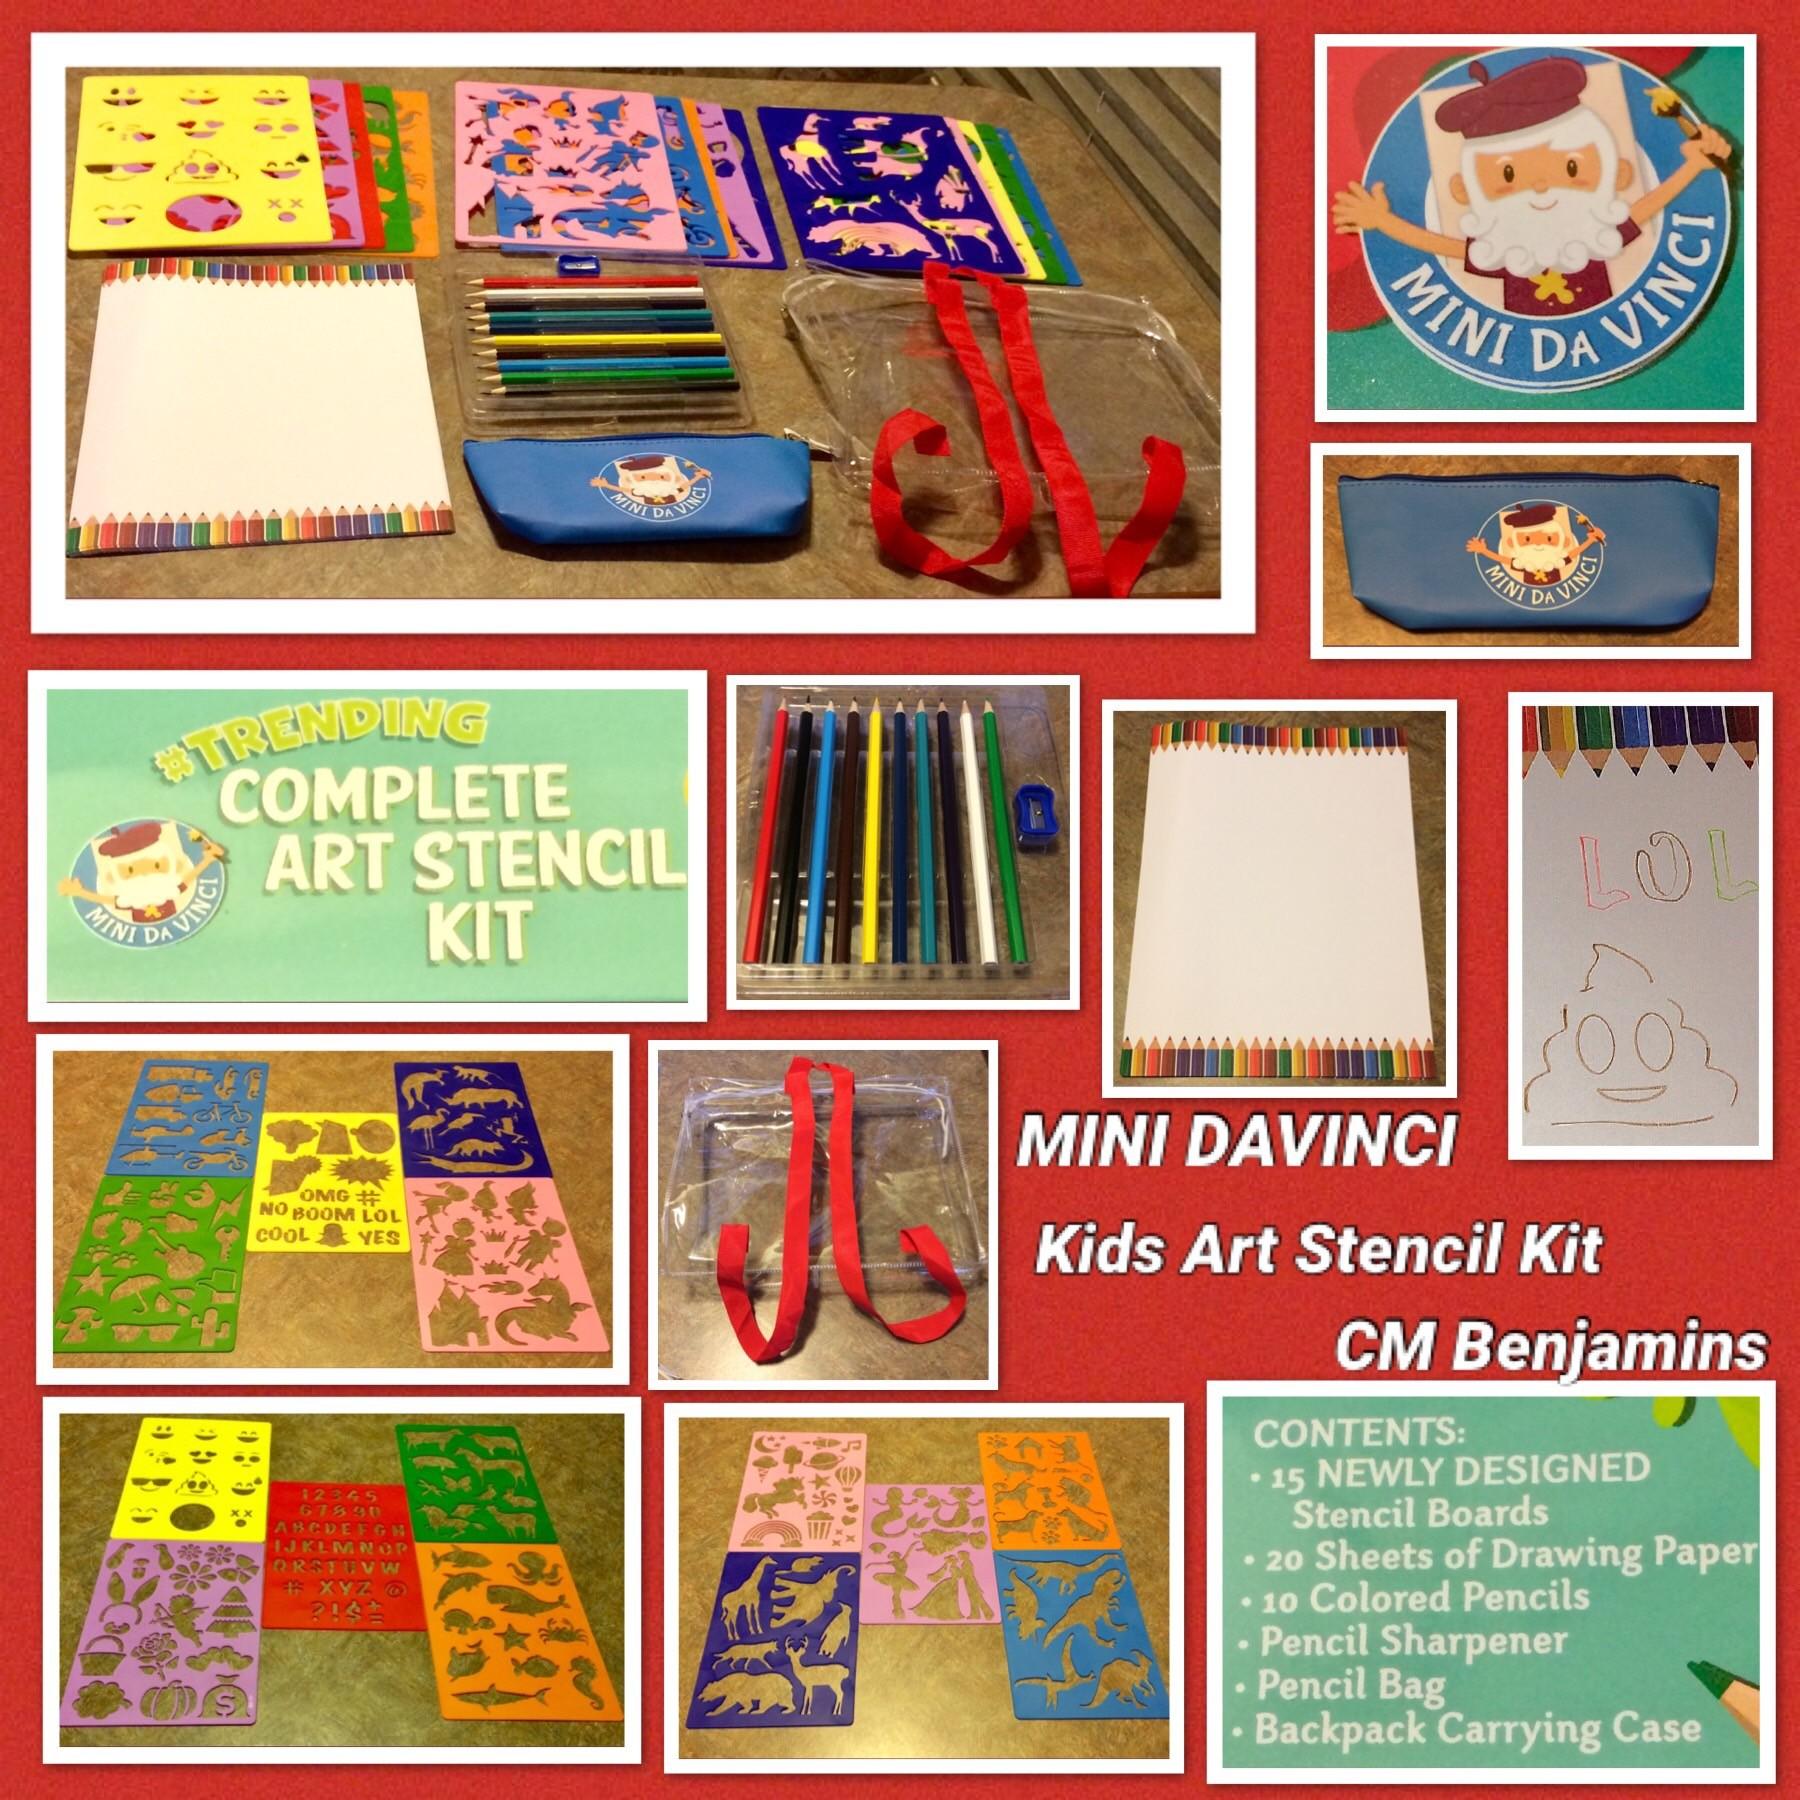 Mini Davinci Fun Stencil - Stencils For Kids - Unicorn Stencils - Emoji Stencils - New For 2019 -Sturdy Classroom Art Drawing Stencils - Shape Stencils And Letter Stencils For Kids - Number Stencils - Gift For Girls And Boys